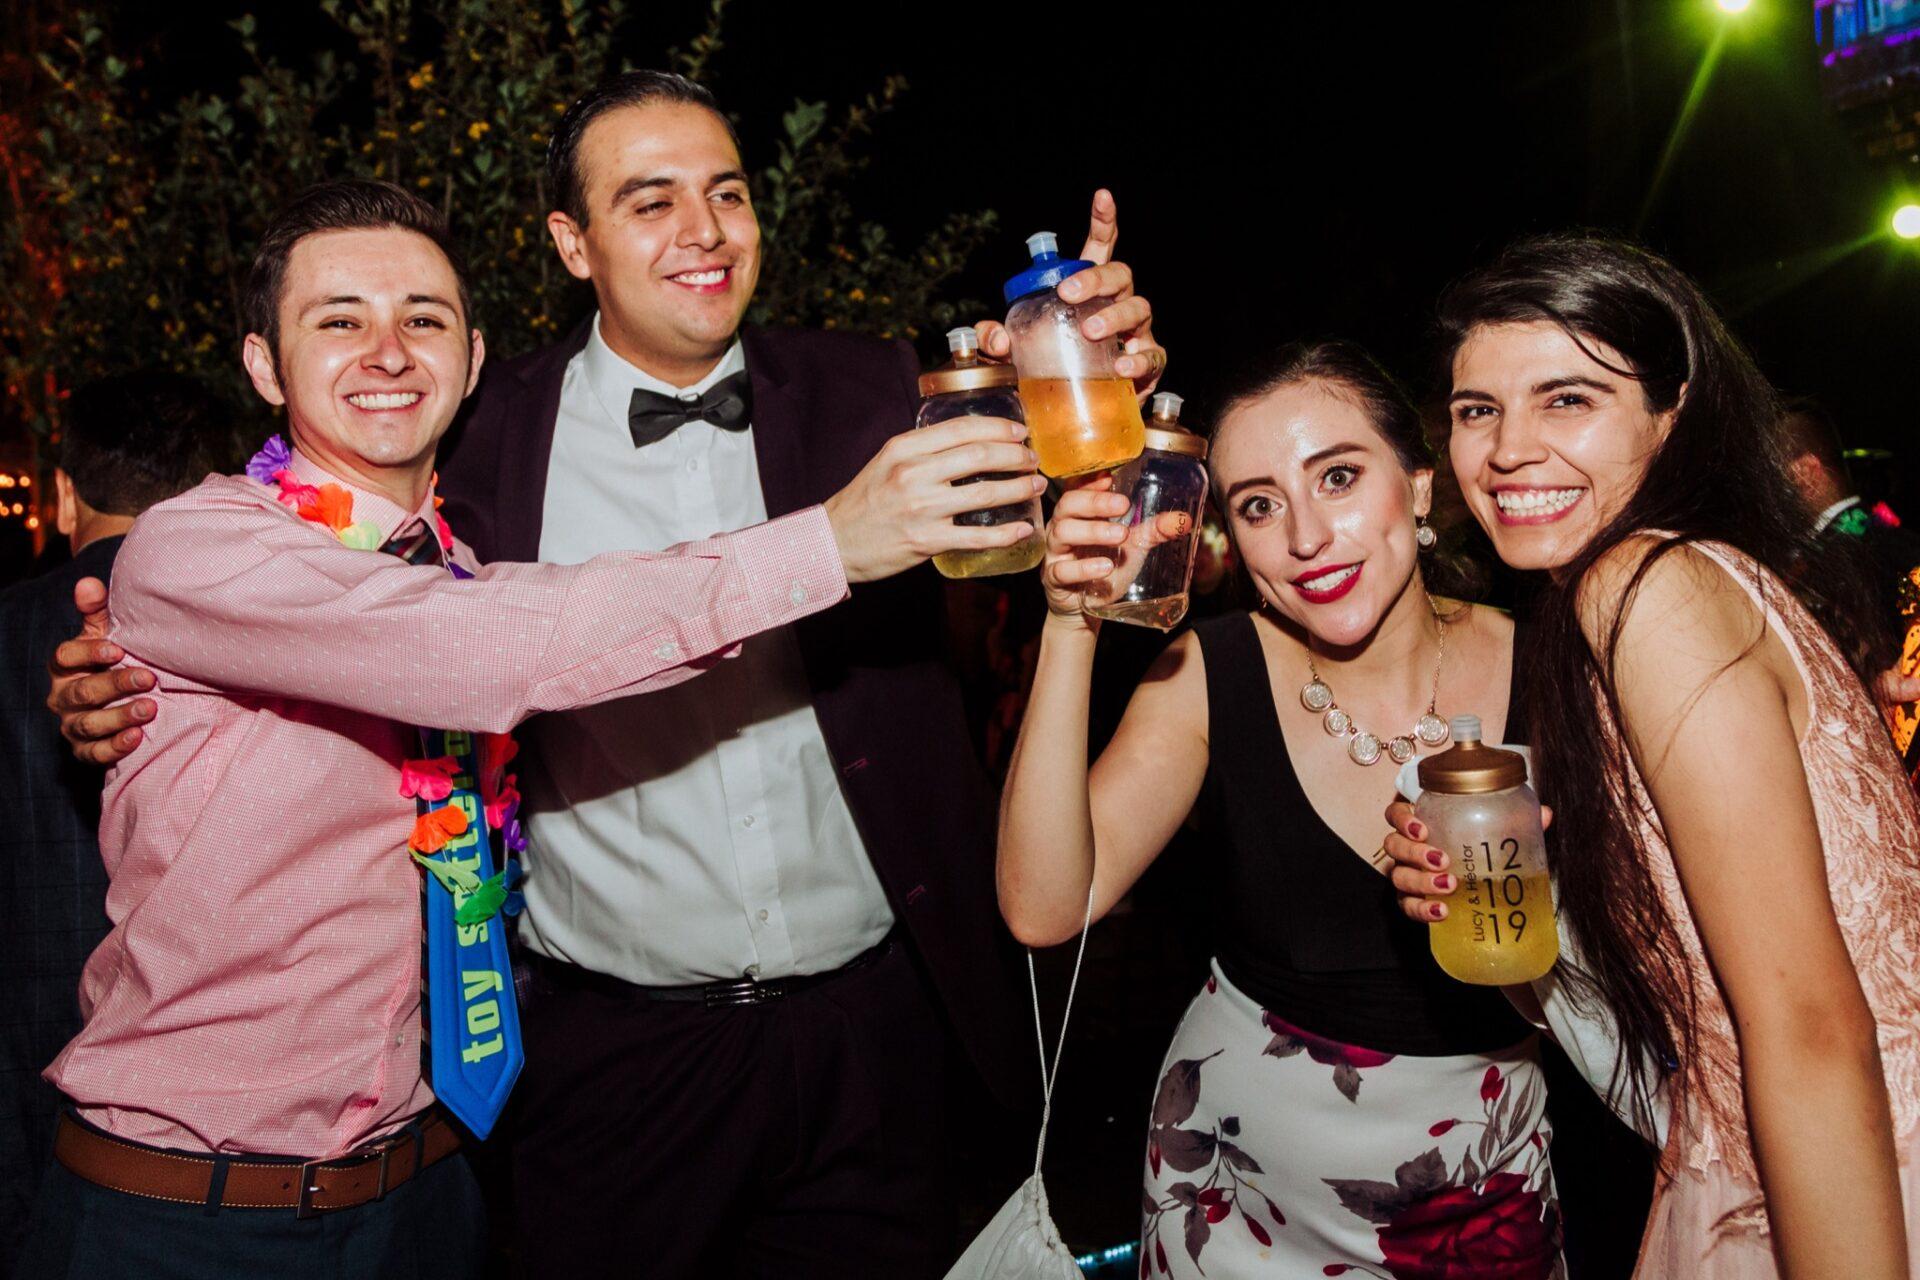 javier_noriega_fotografo_bodas_teul_zacatecas_wedding_photographer46